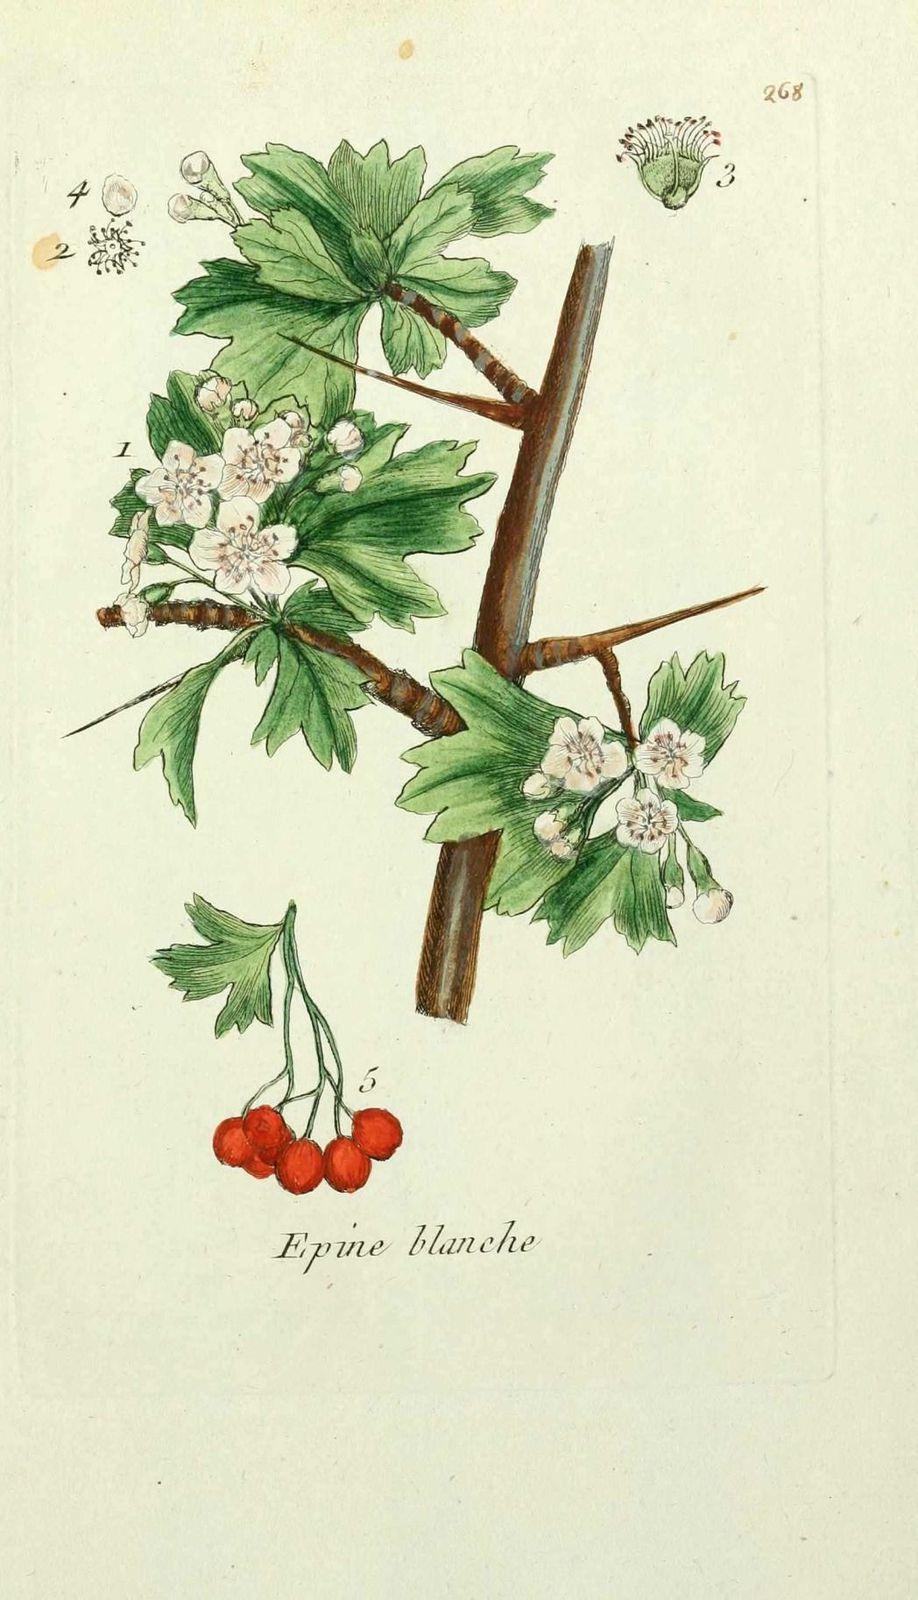 aubepine - crataegus oxyacantha ( noble epine, epine blanch